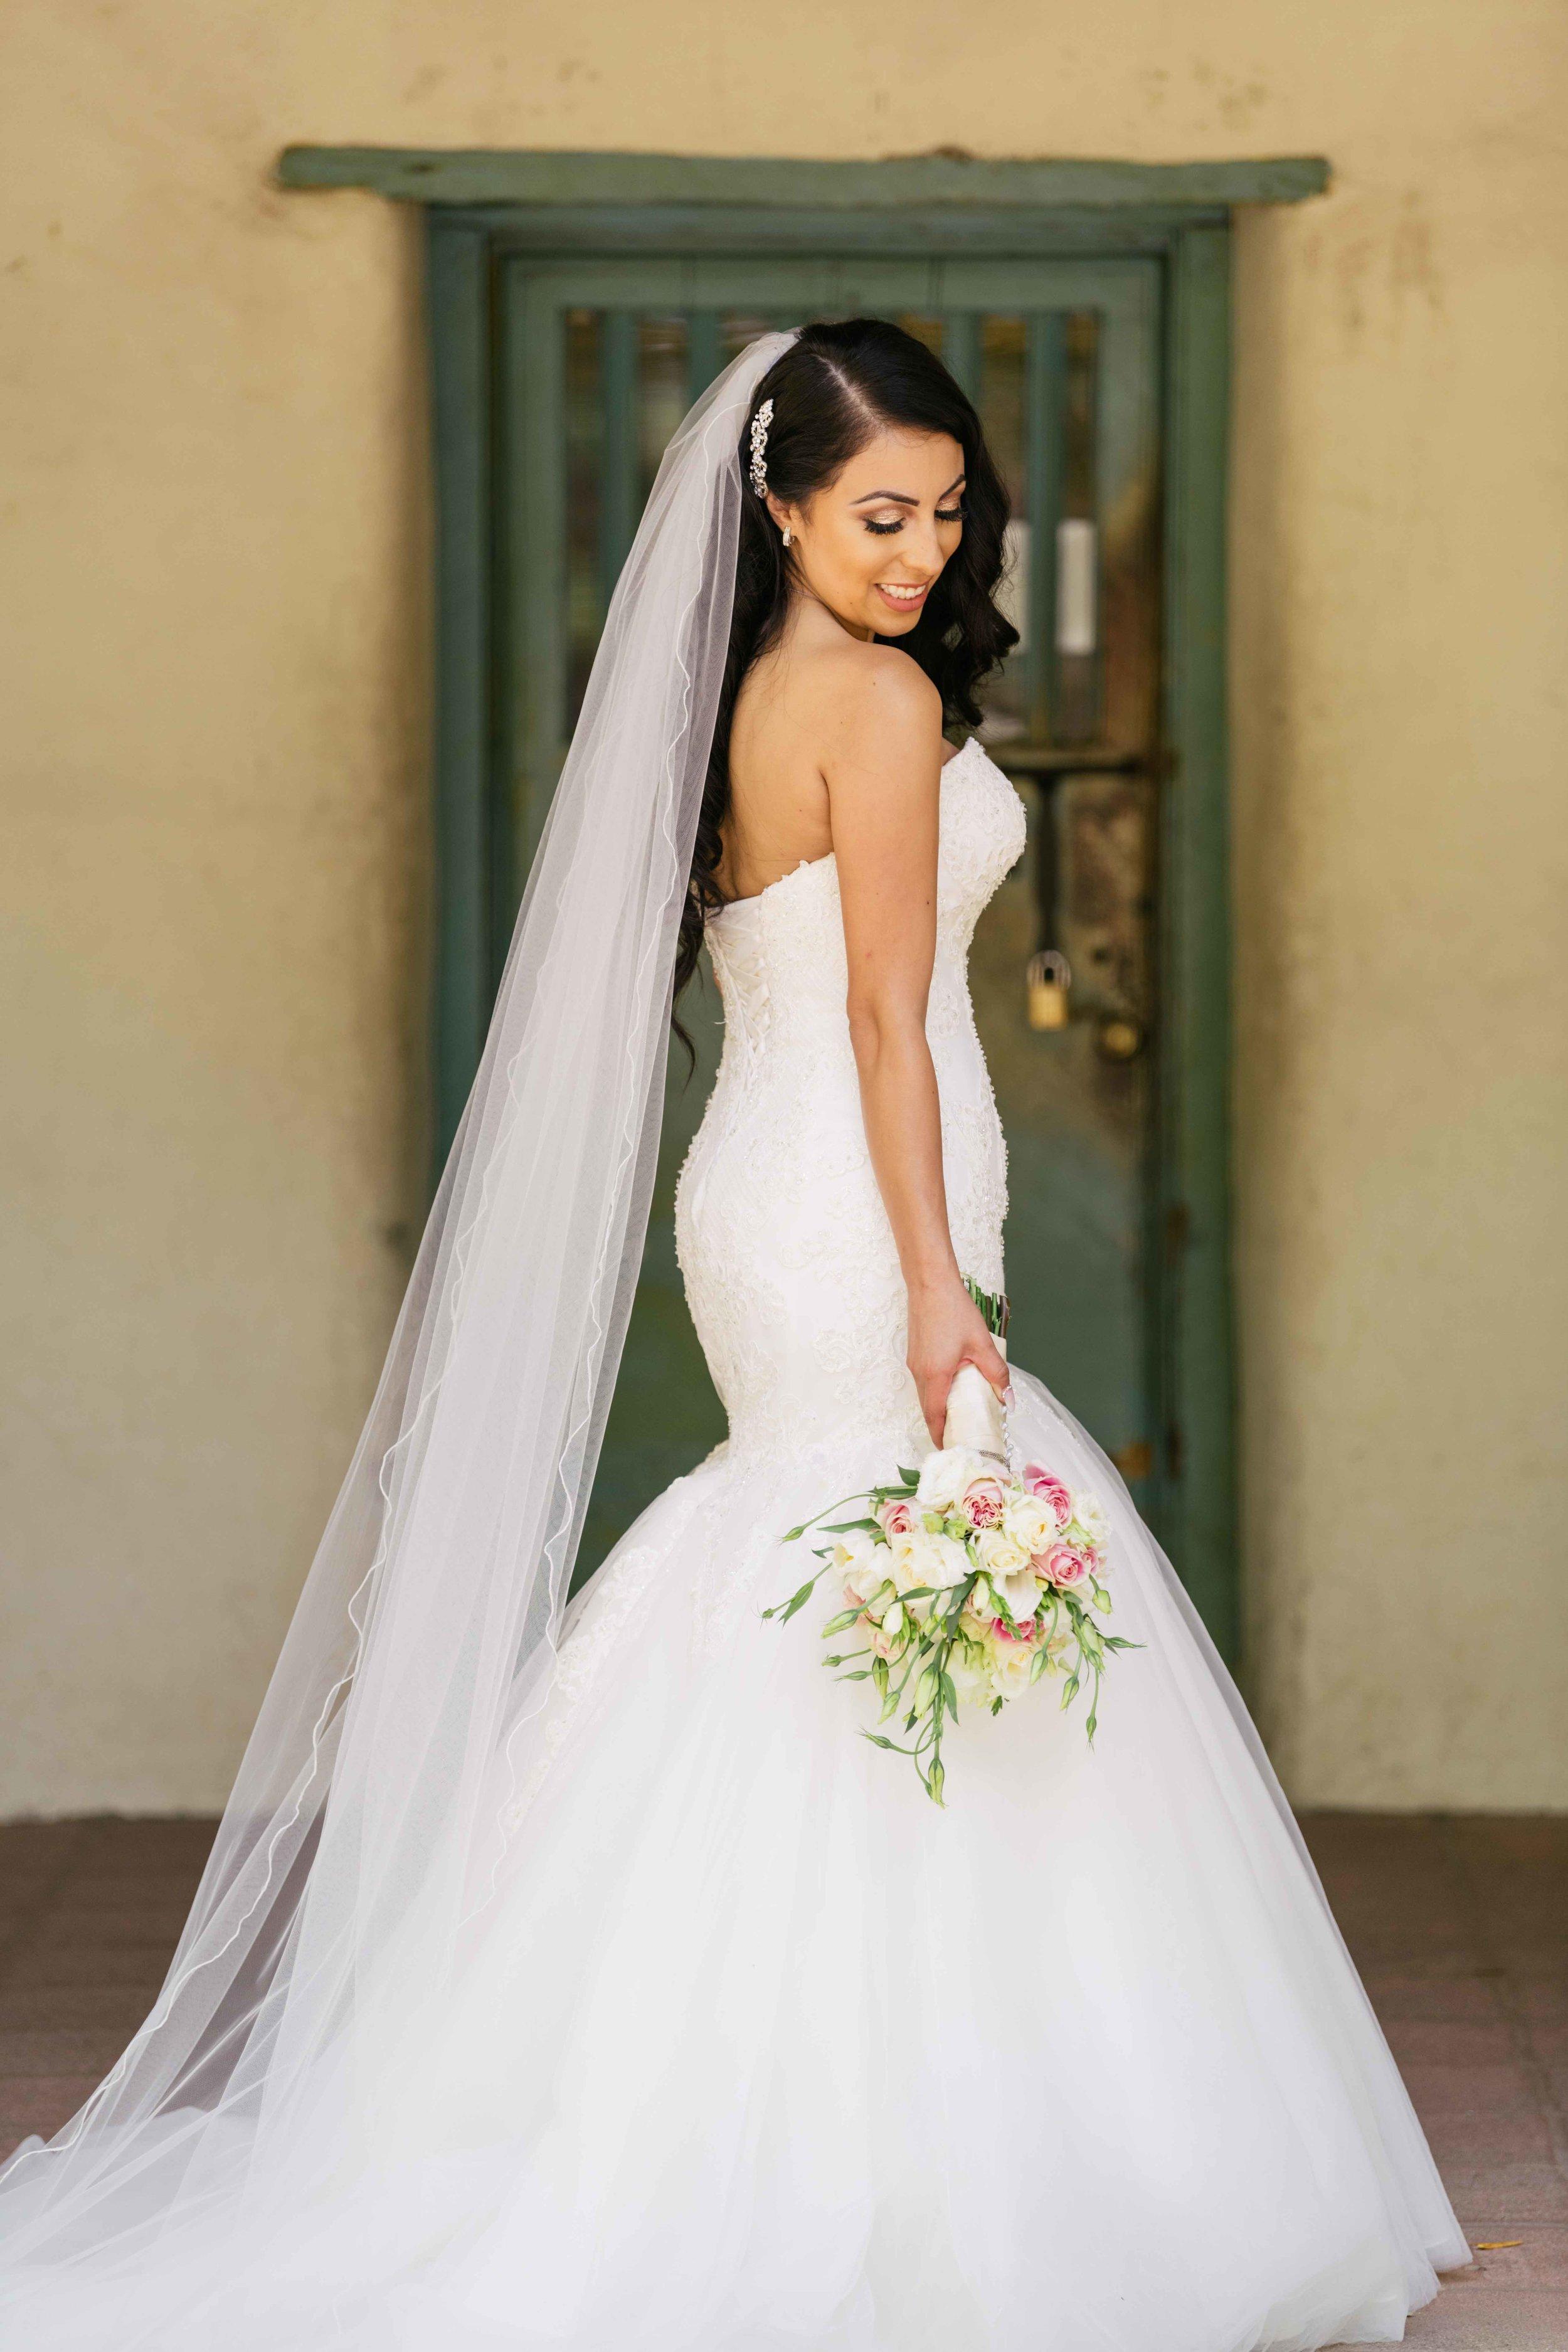 san-juan-bautista-photographer-tony-monse-wedding-384.JPG